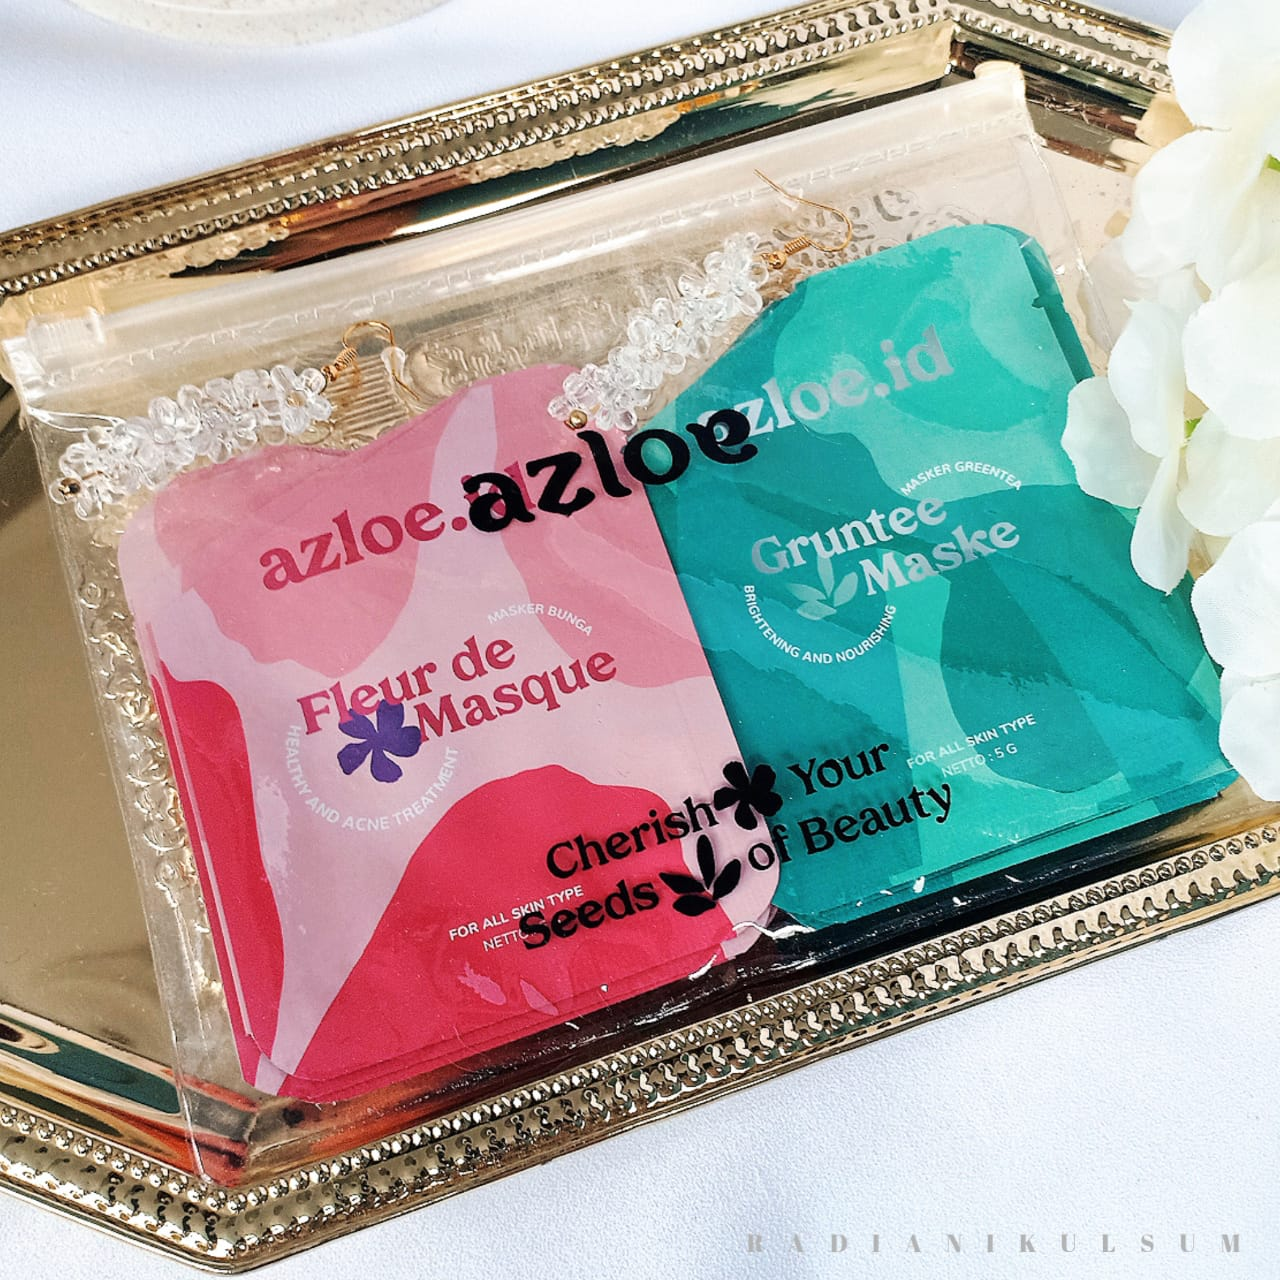 Azloe Fleur de Masque & Gruntee Maske